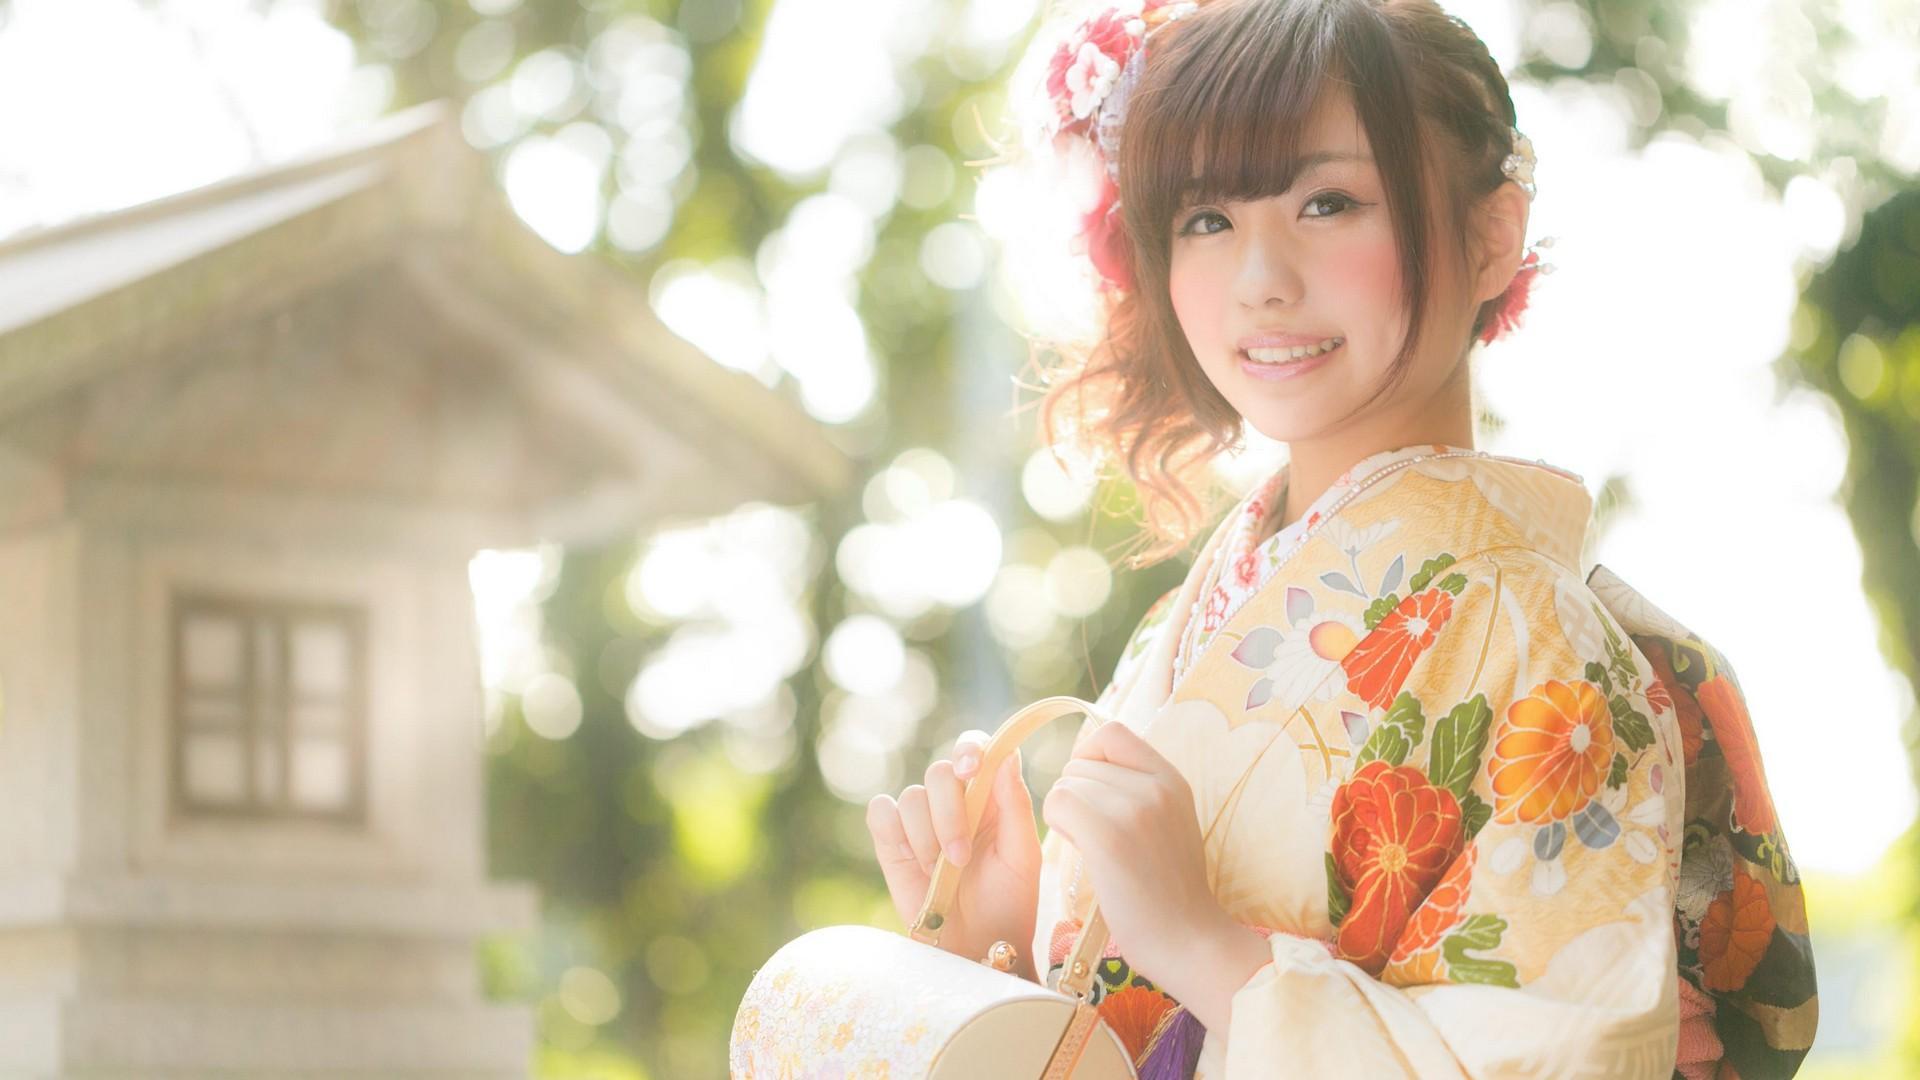 Japanese Girl Wallpapers Wallpaper Cave